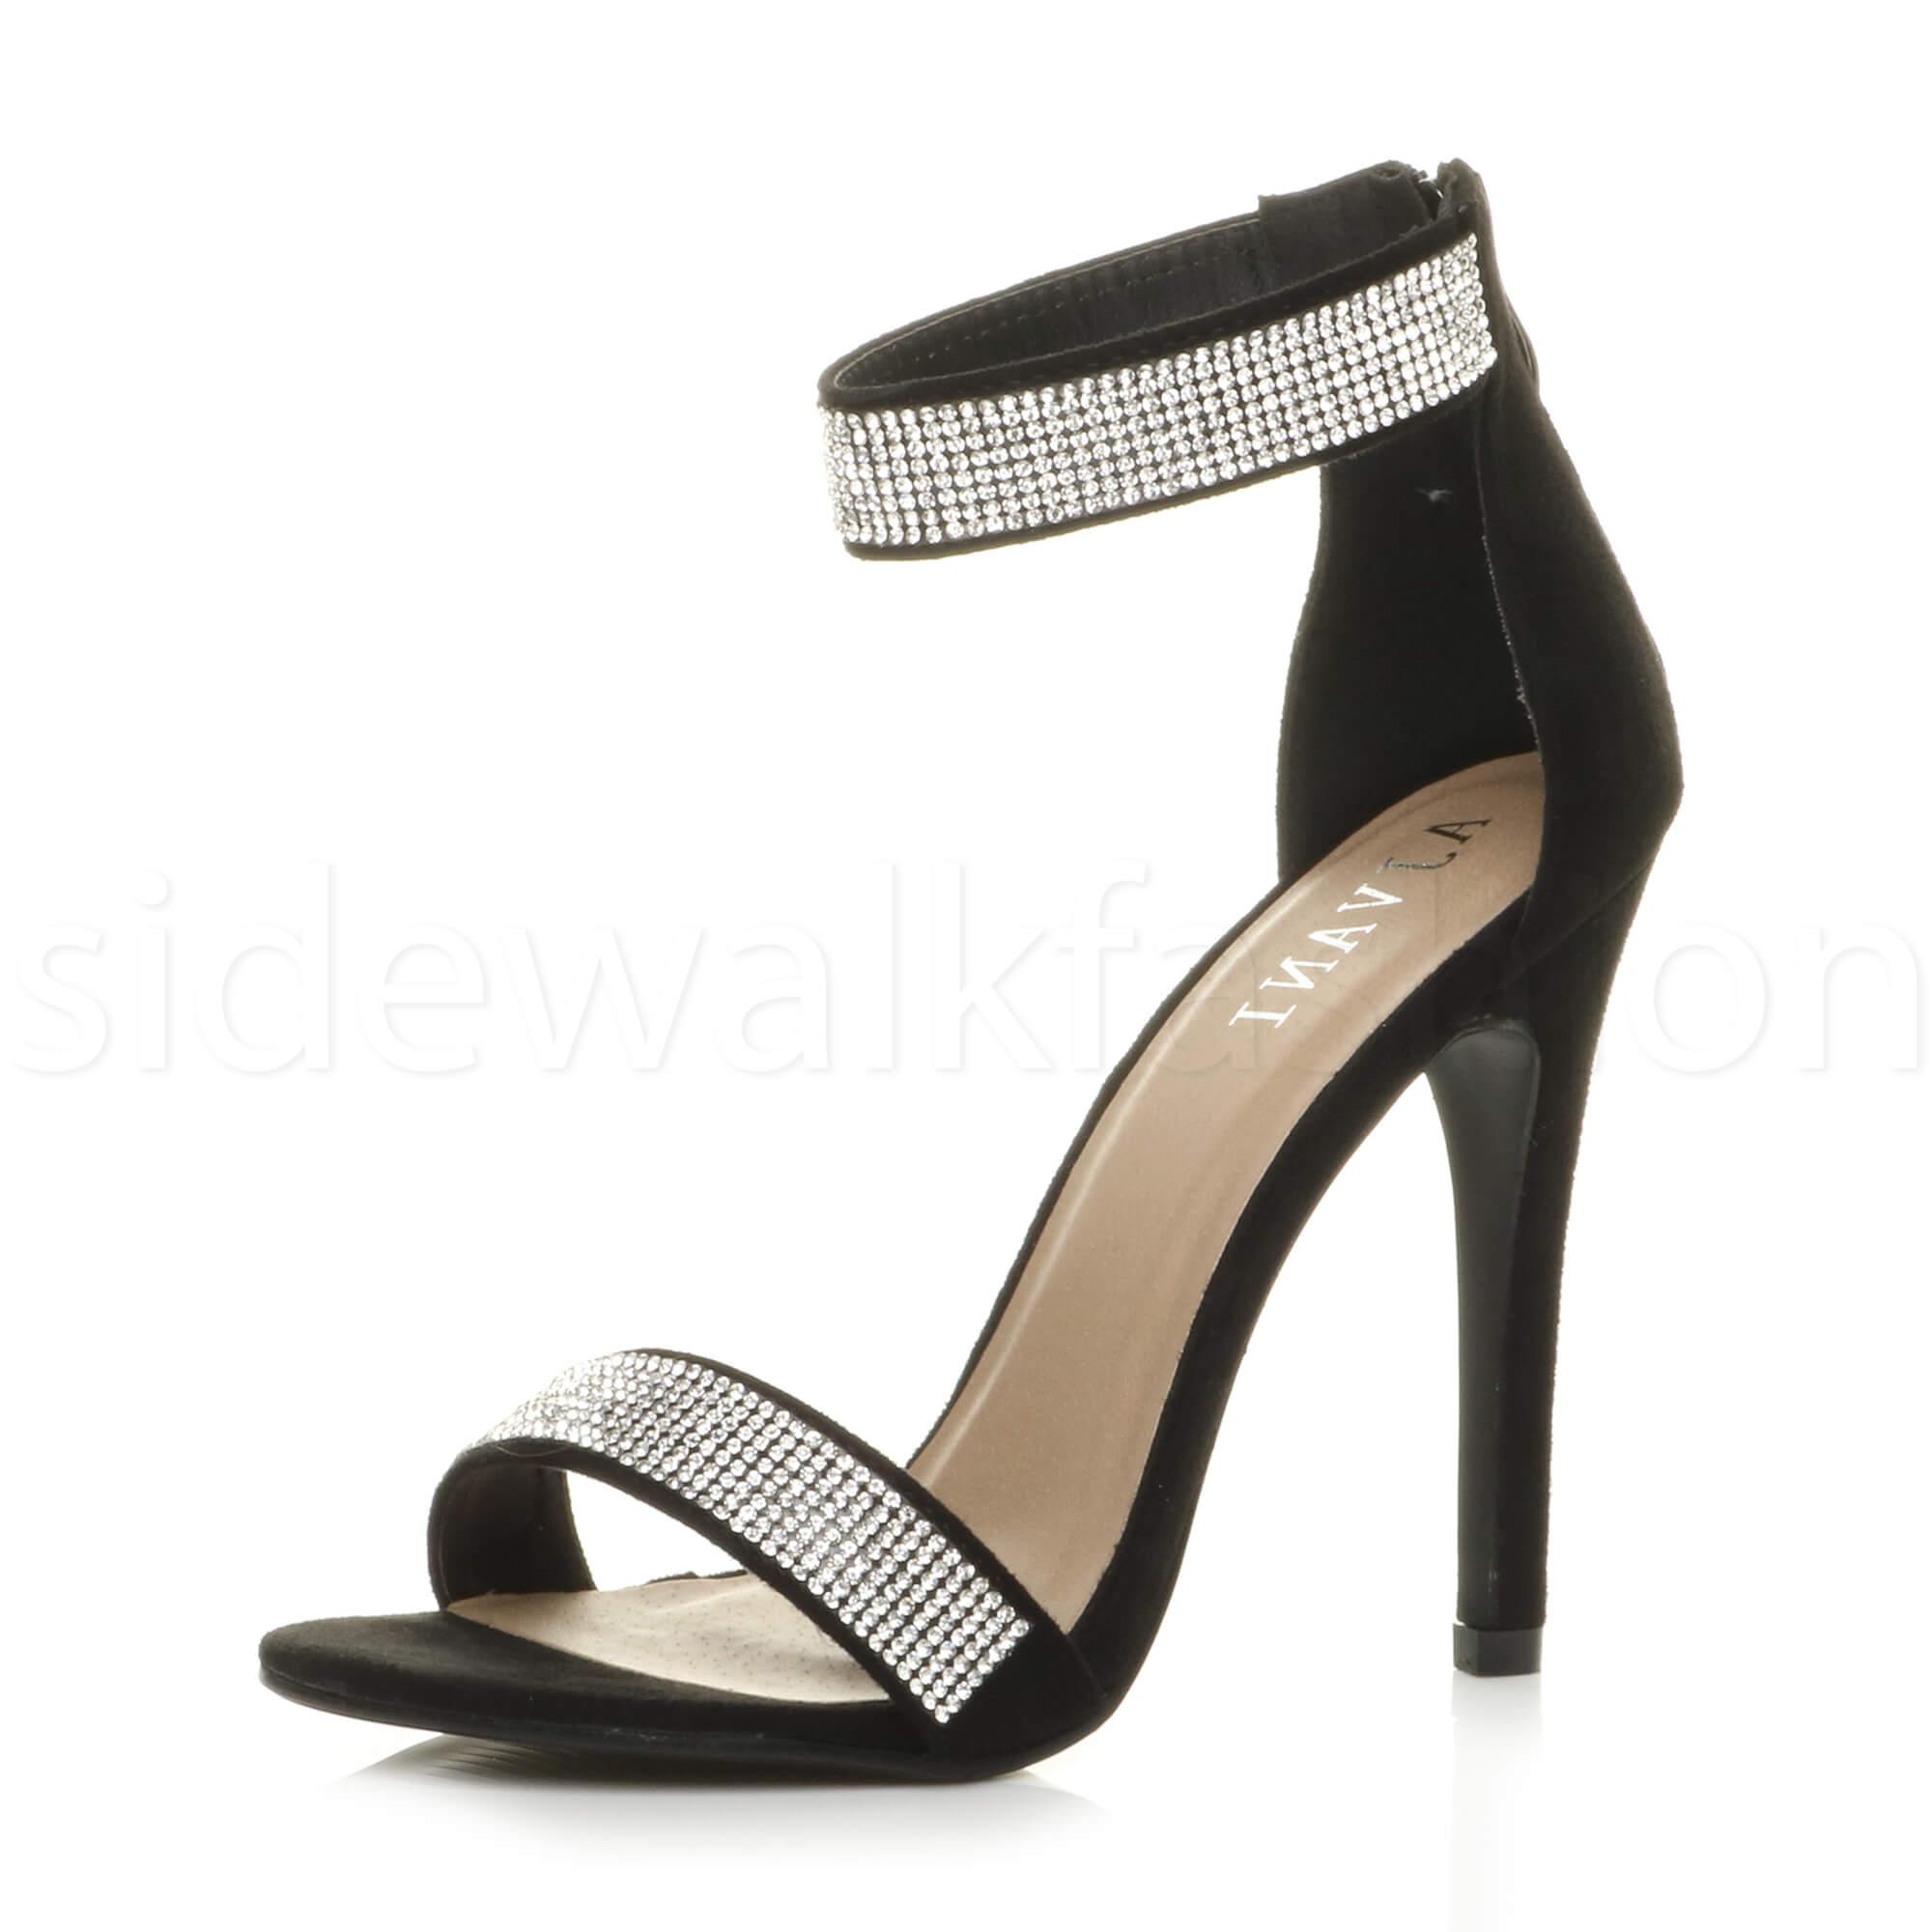 7af807d909c2 Womens ladies high heel ankle strap diamante sandals party evening shoes  size